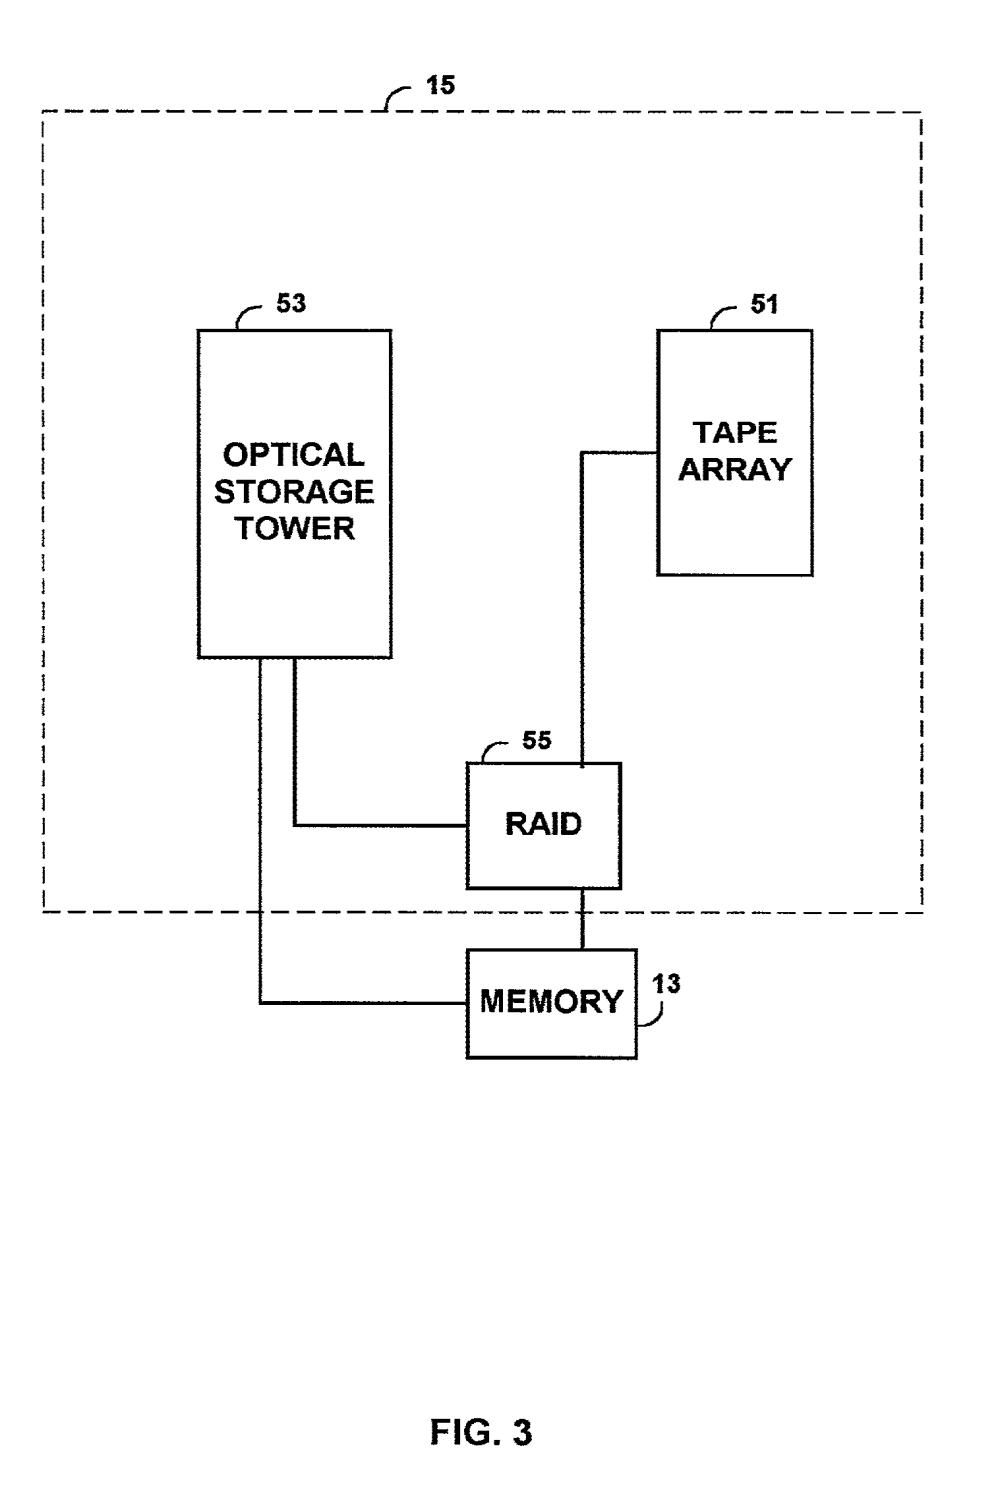 medium resolution of us9055319b2 interactive guide with recording google patents block diagram sbd dvd player recorder ticom